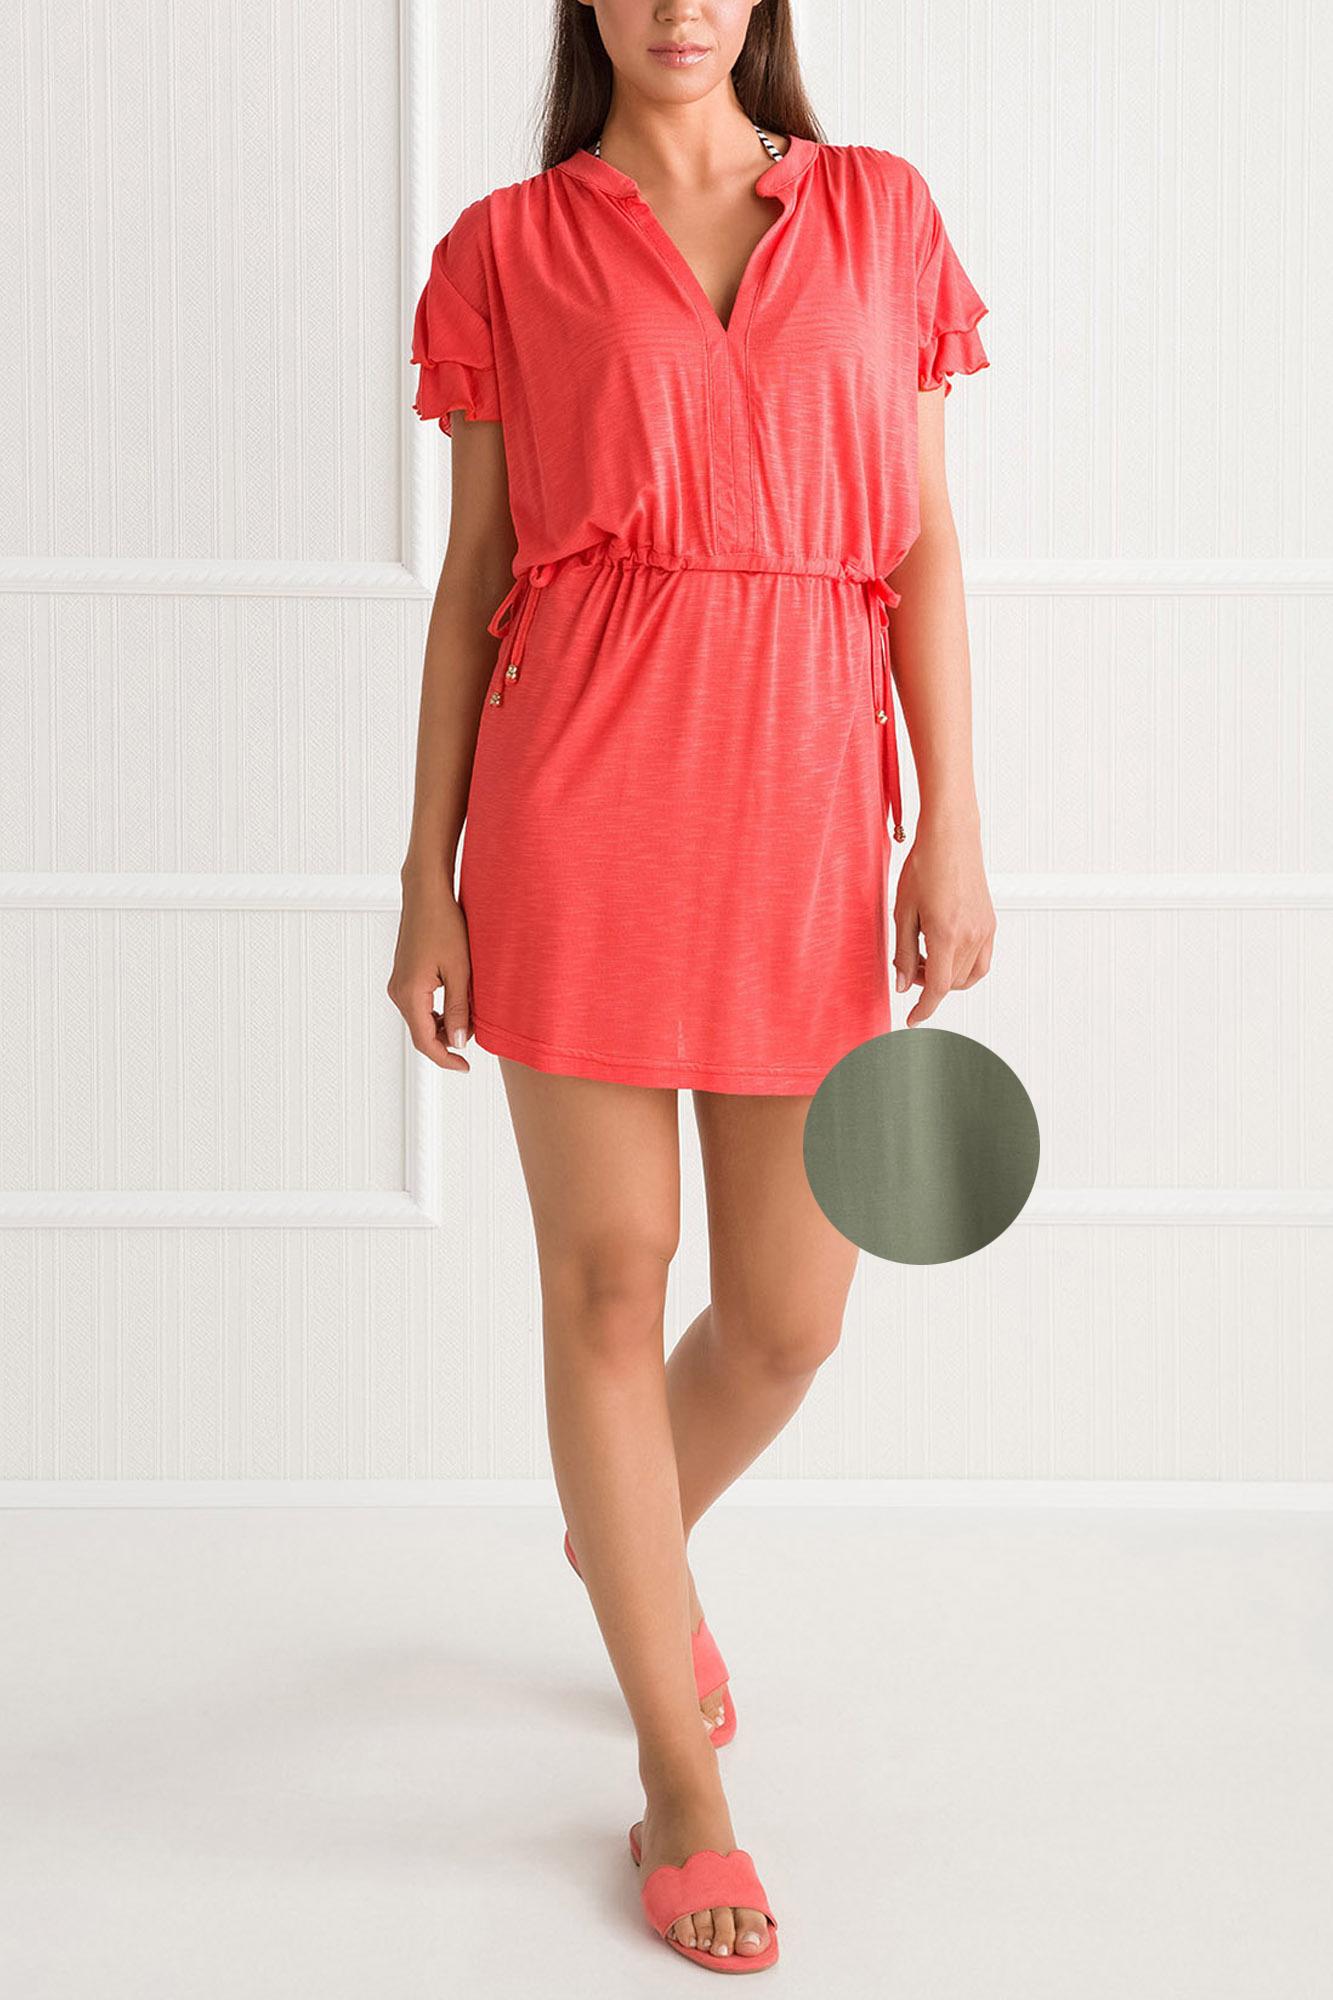 0a7c93ead520 Γυναικείο καφτάνι Vamp - Beachwear Λαδί - Viscose